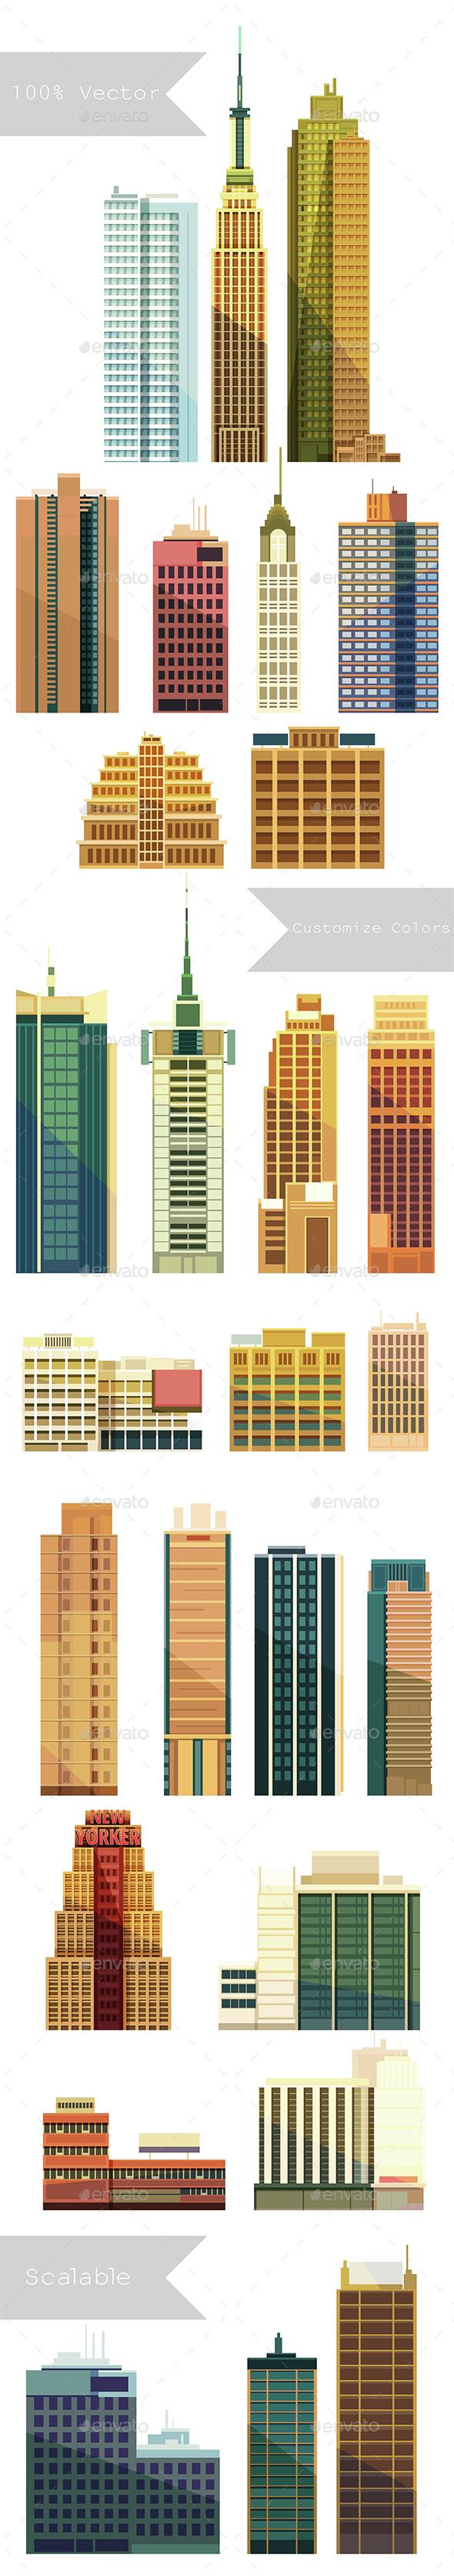 City Buildings Set  - Buildings Objects